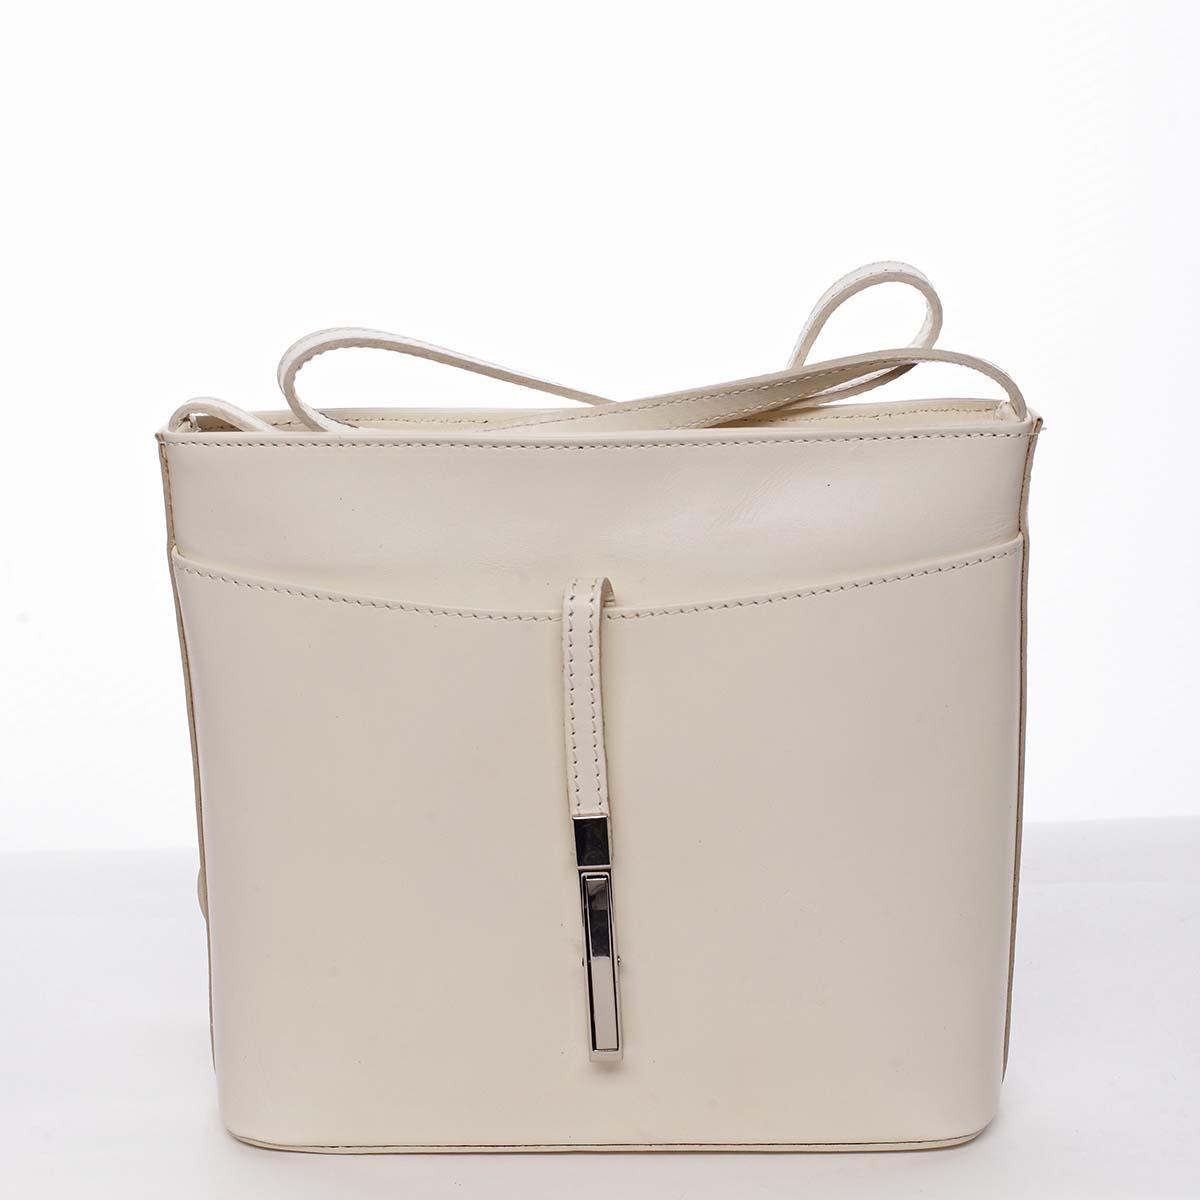 Dámská kožená crossbody kabelka béžová - ItalY Aneta